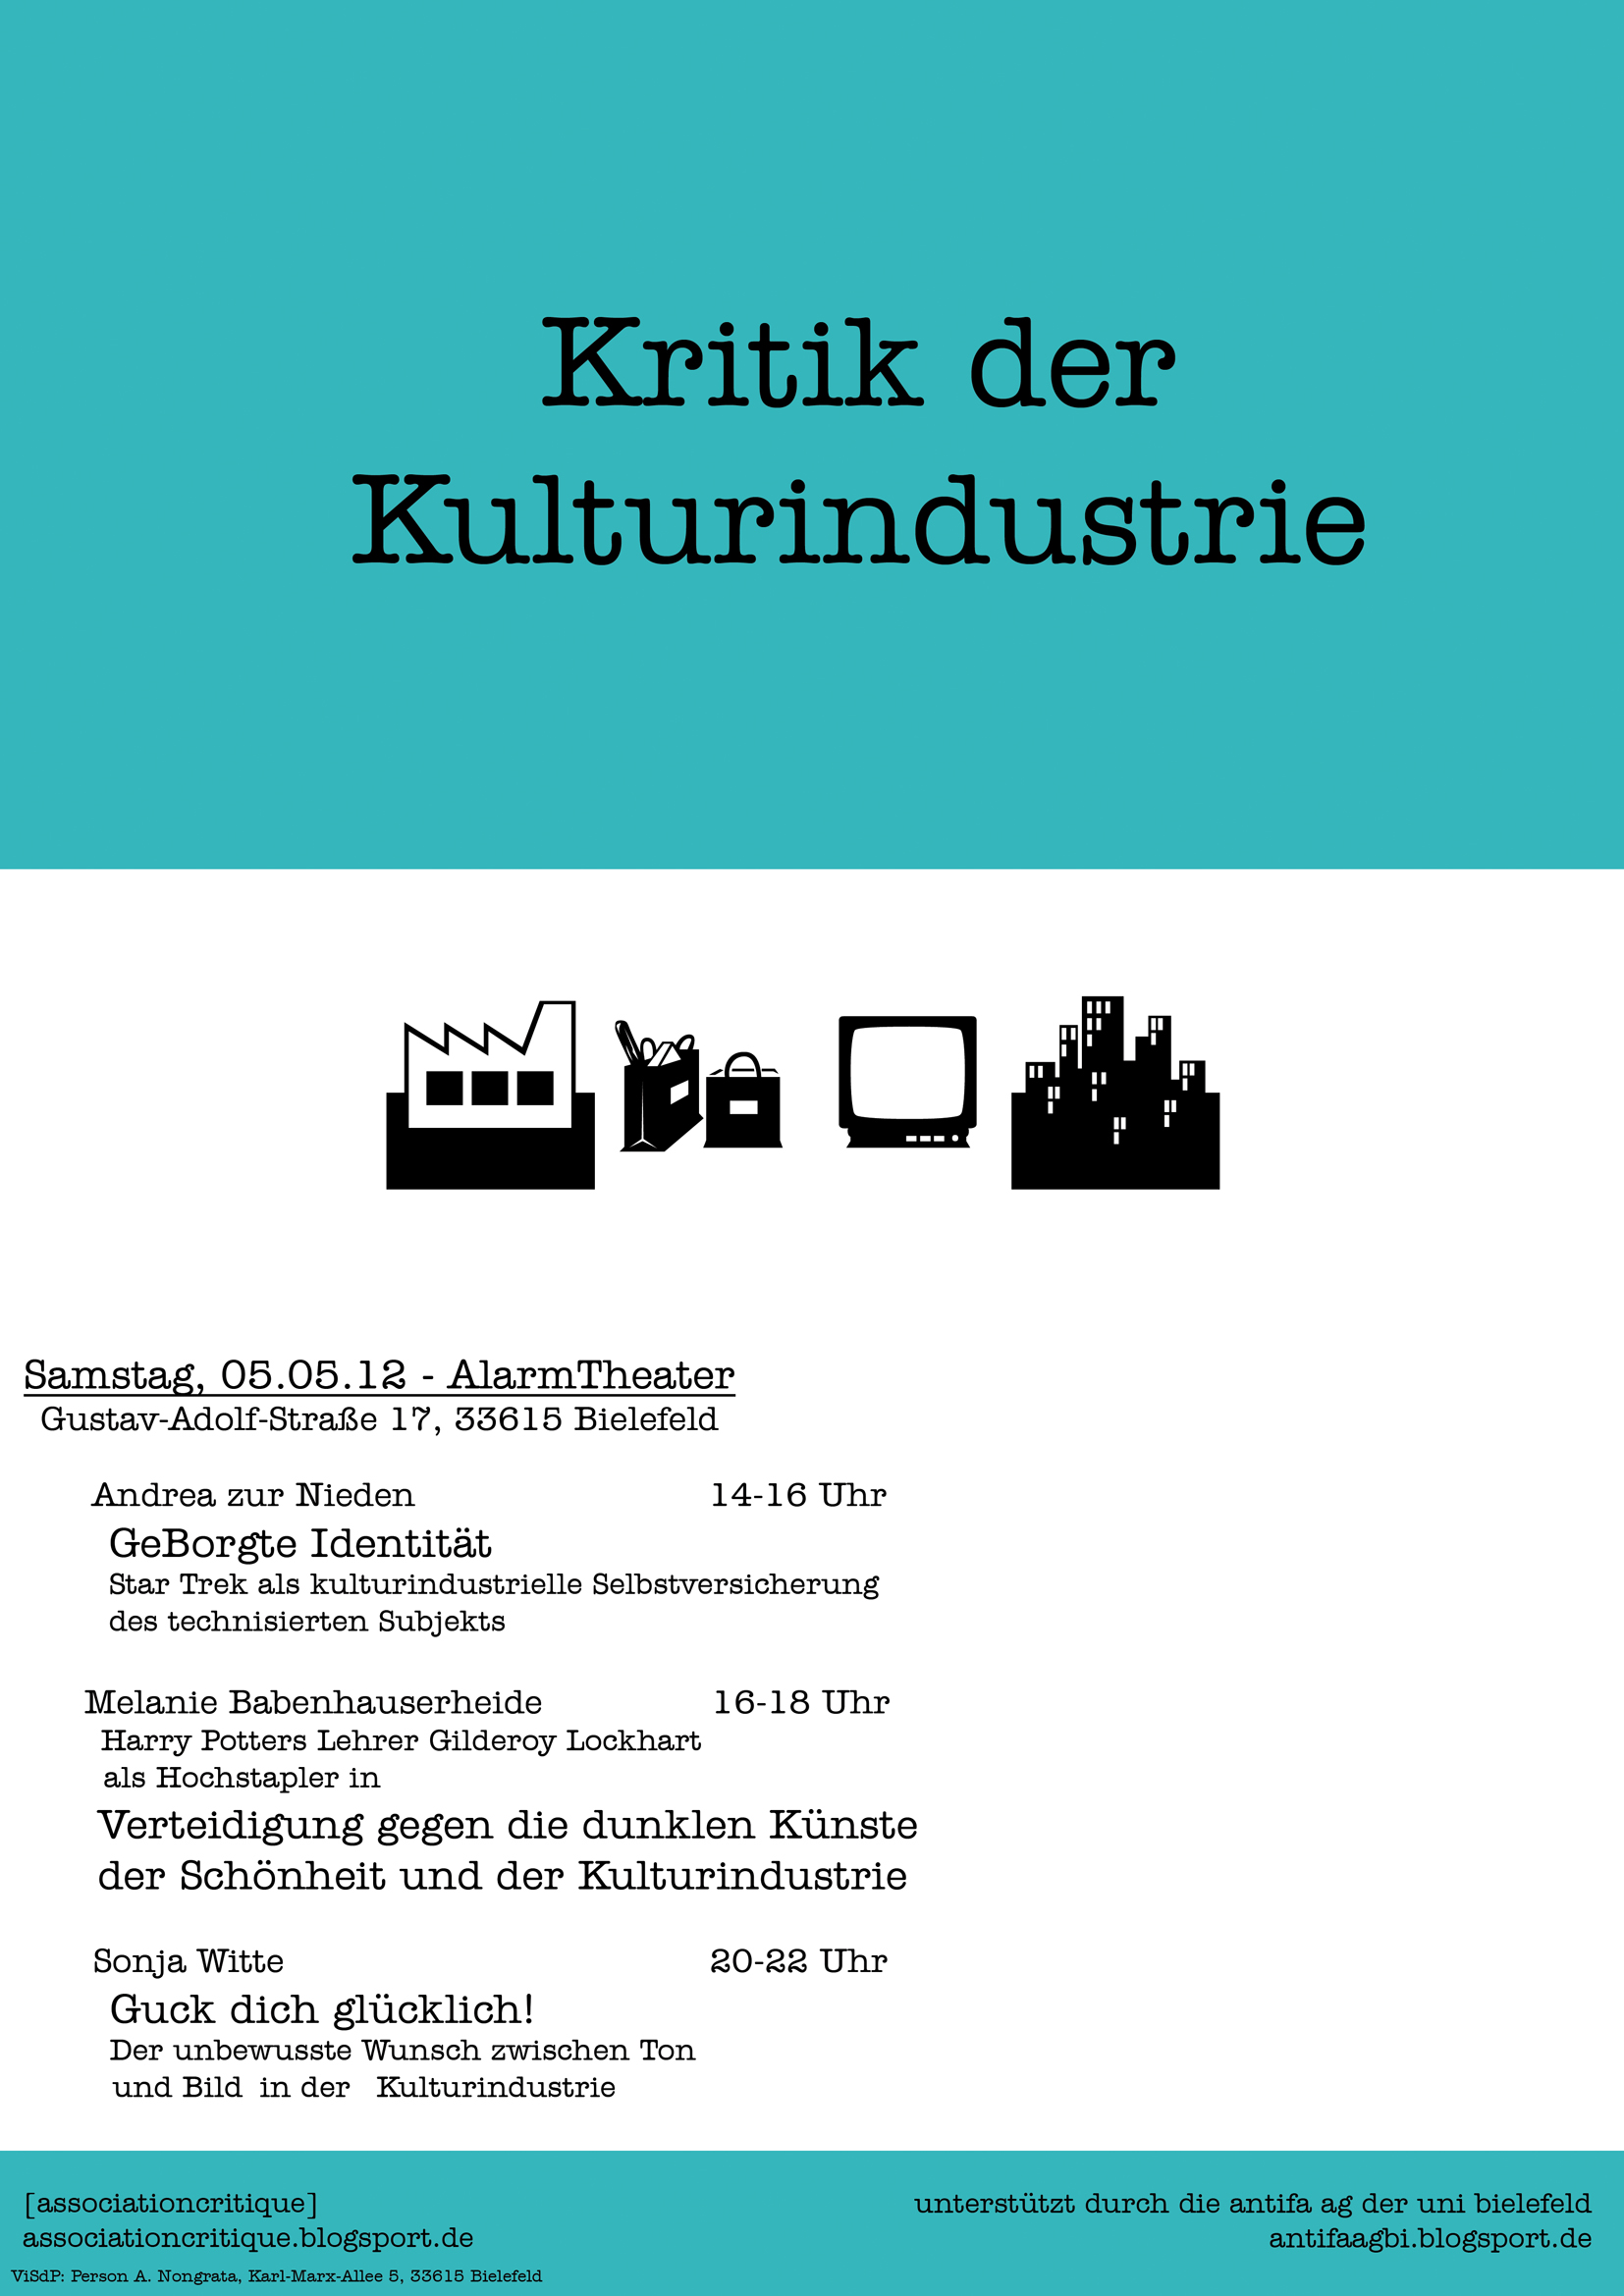 Kritik der Kulturindustrie, 5.5.2012